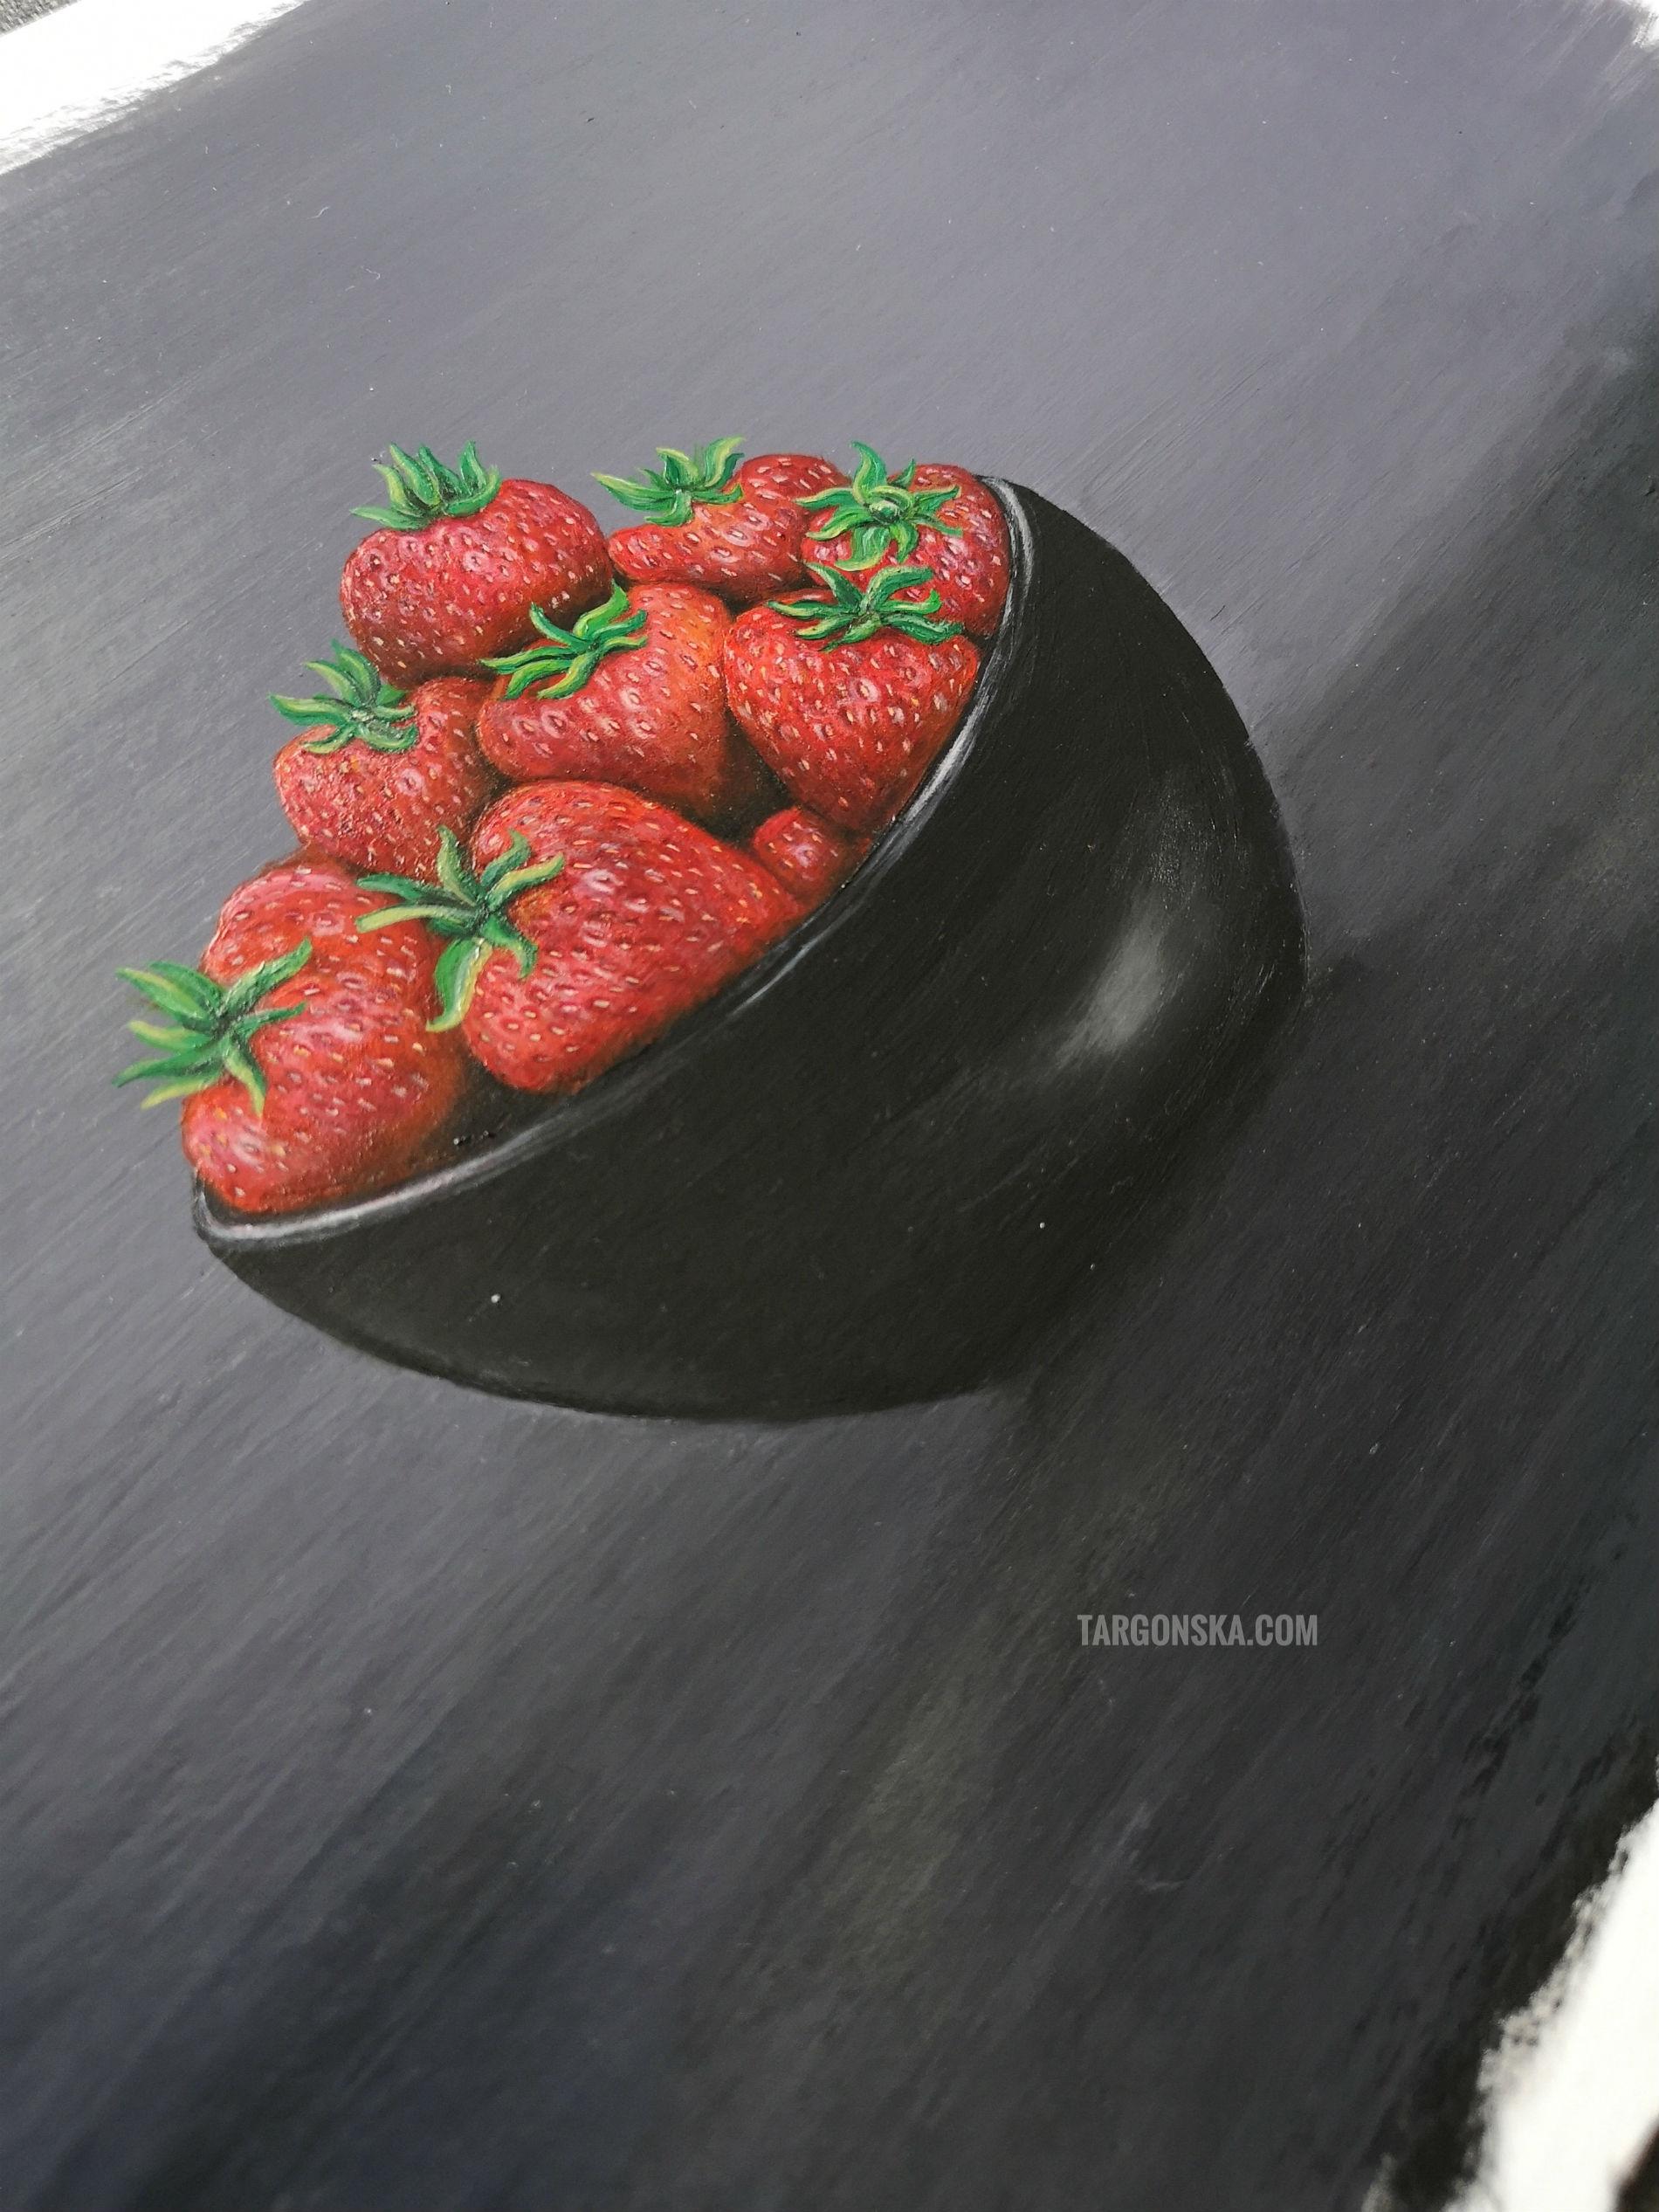 malgorzata targonska Bowl of strawberries